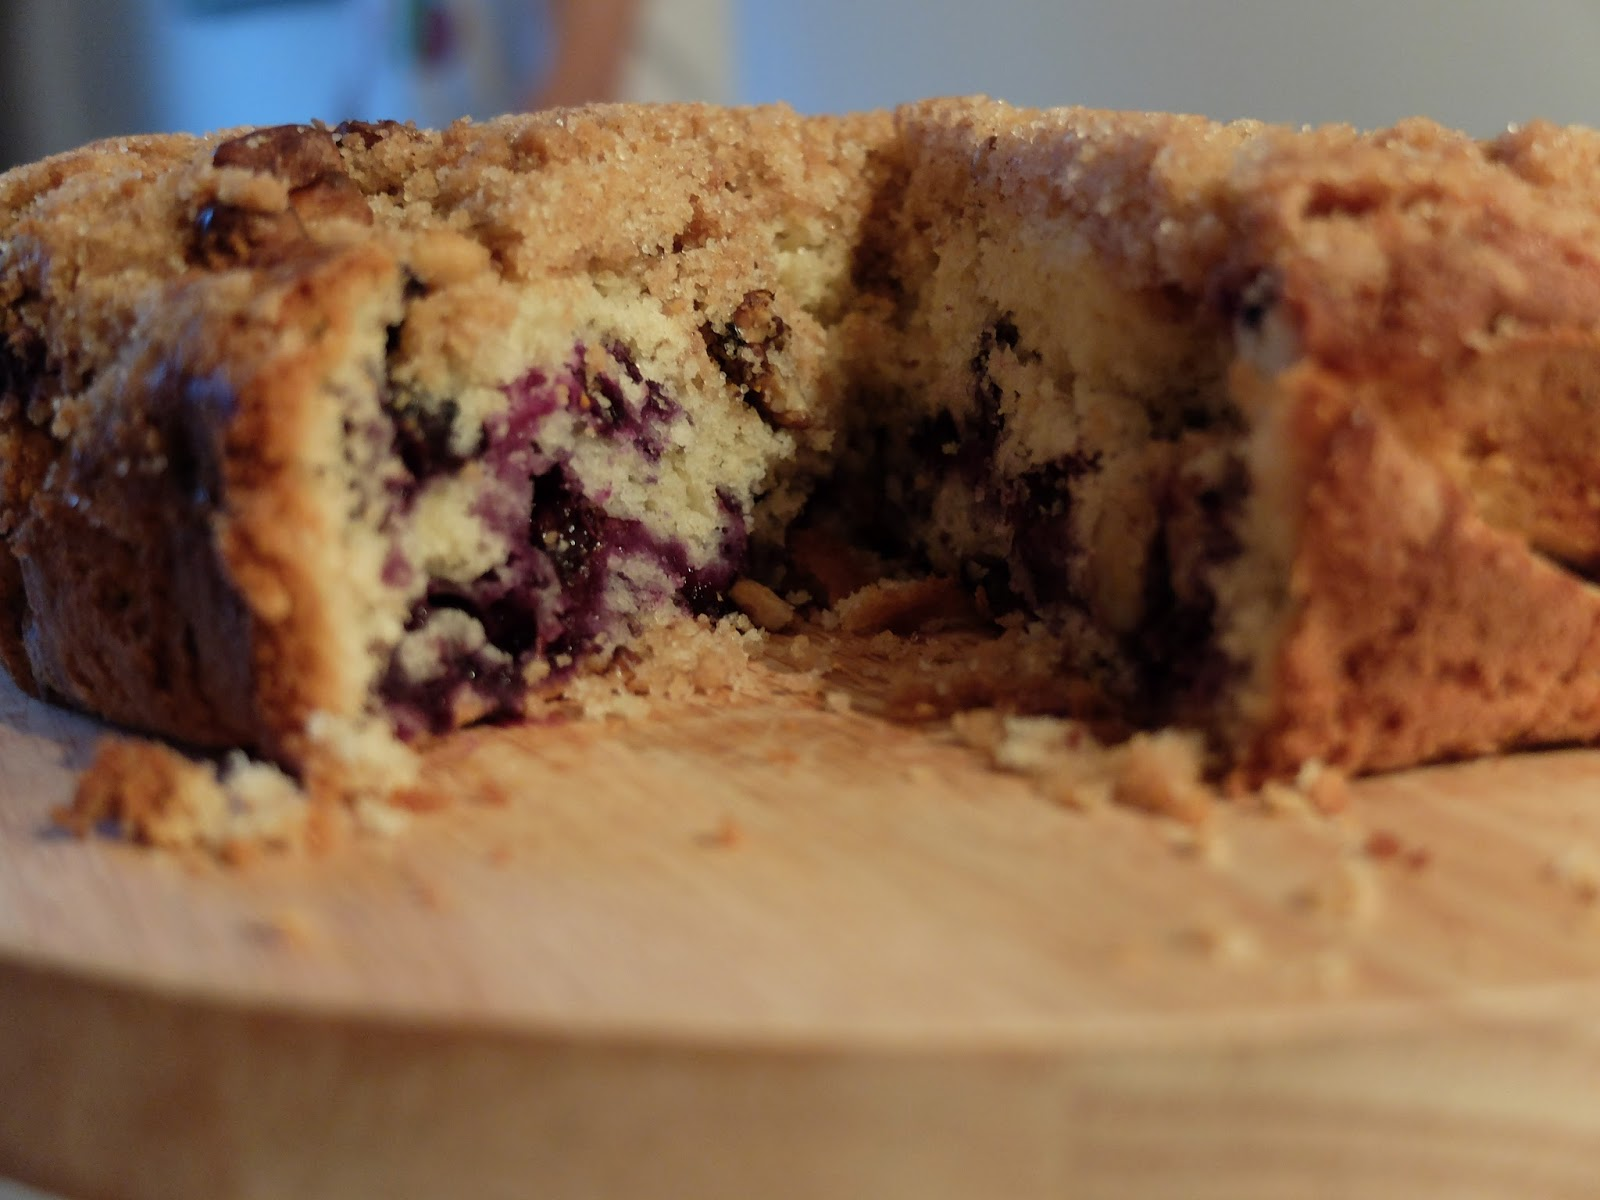 Honey Ricotta Smitten Kitchen Blueberry Crumb Cake